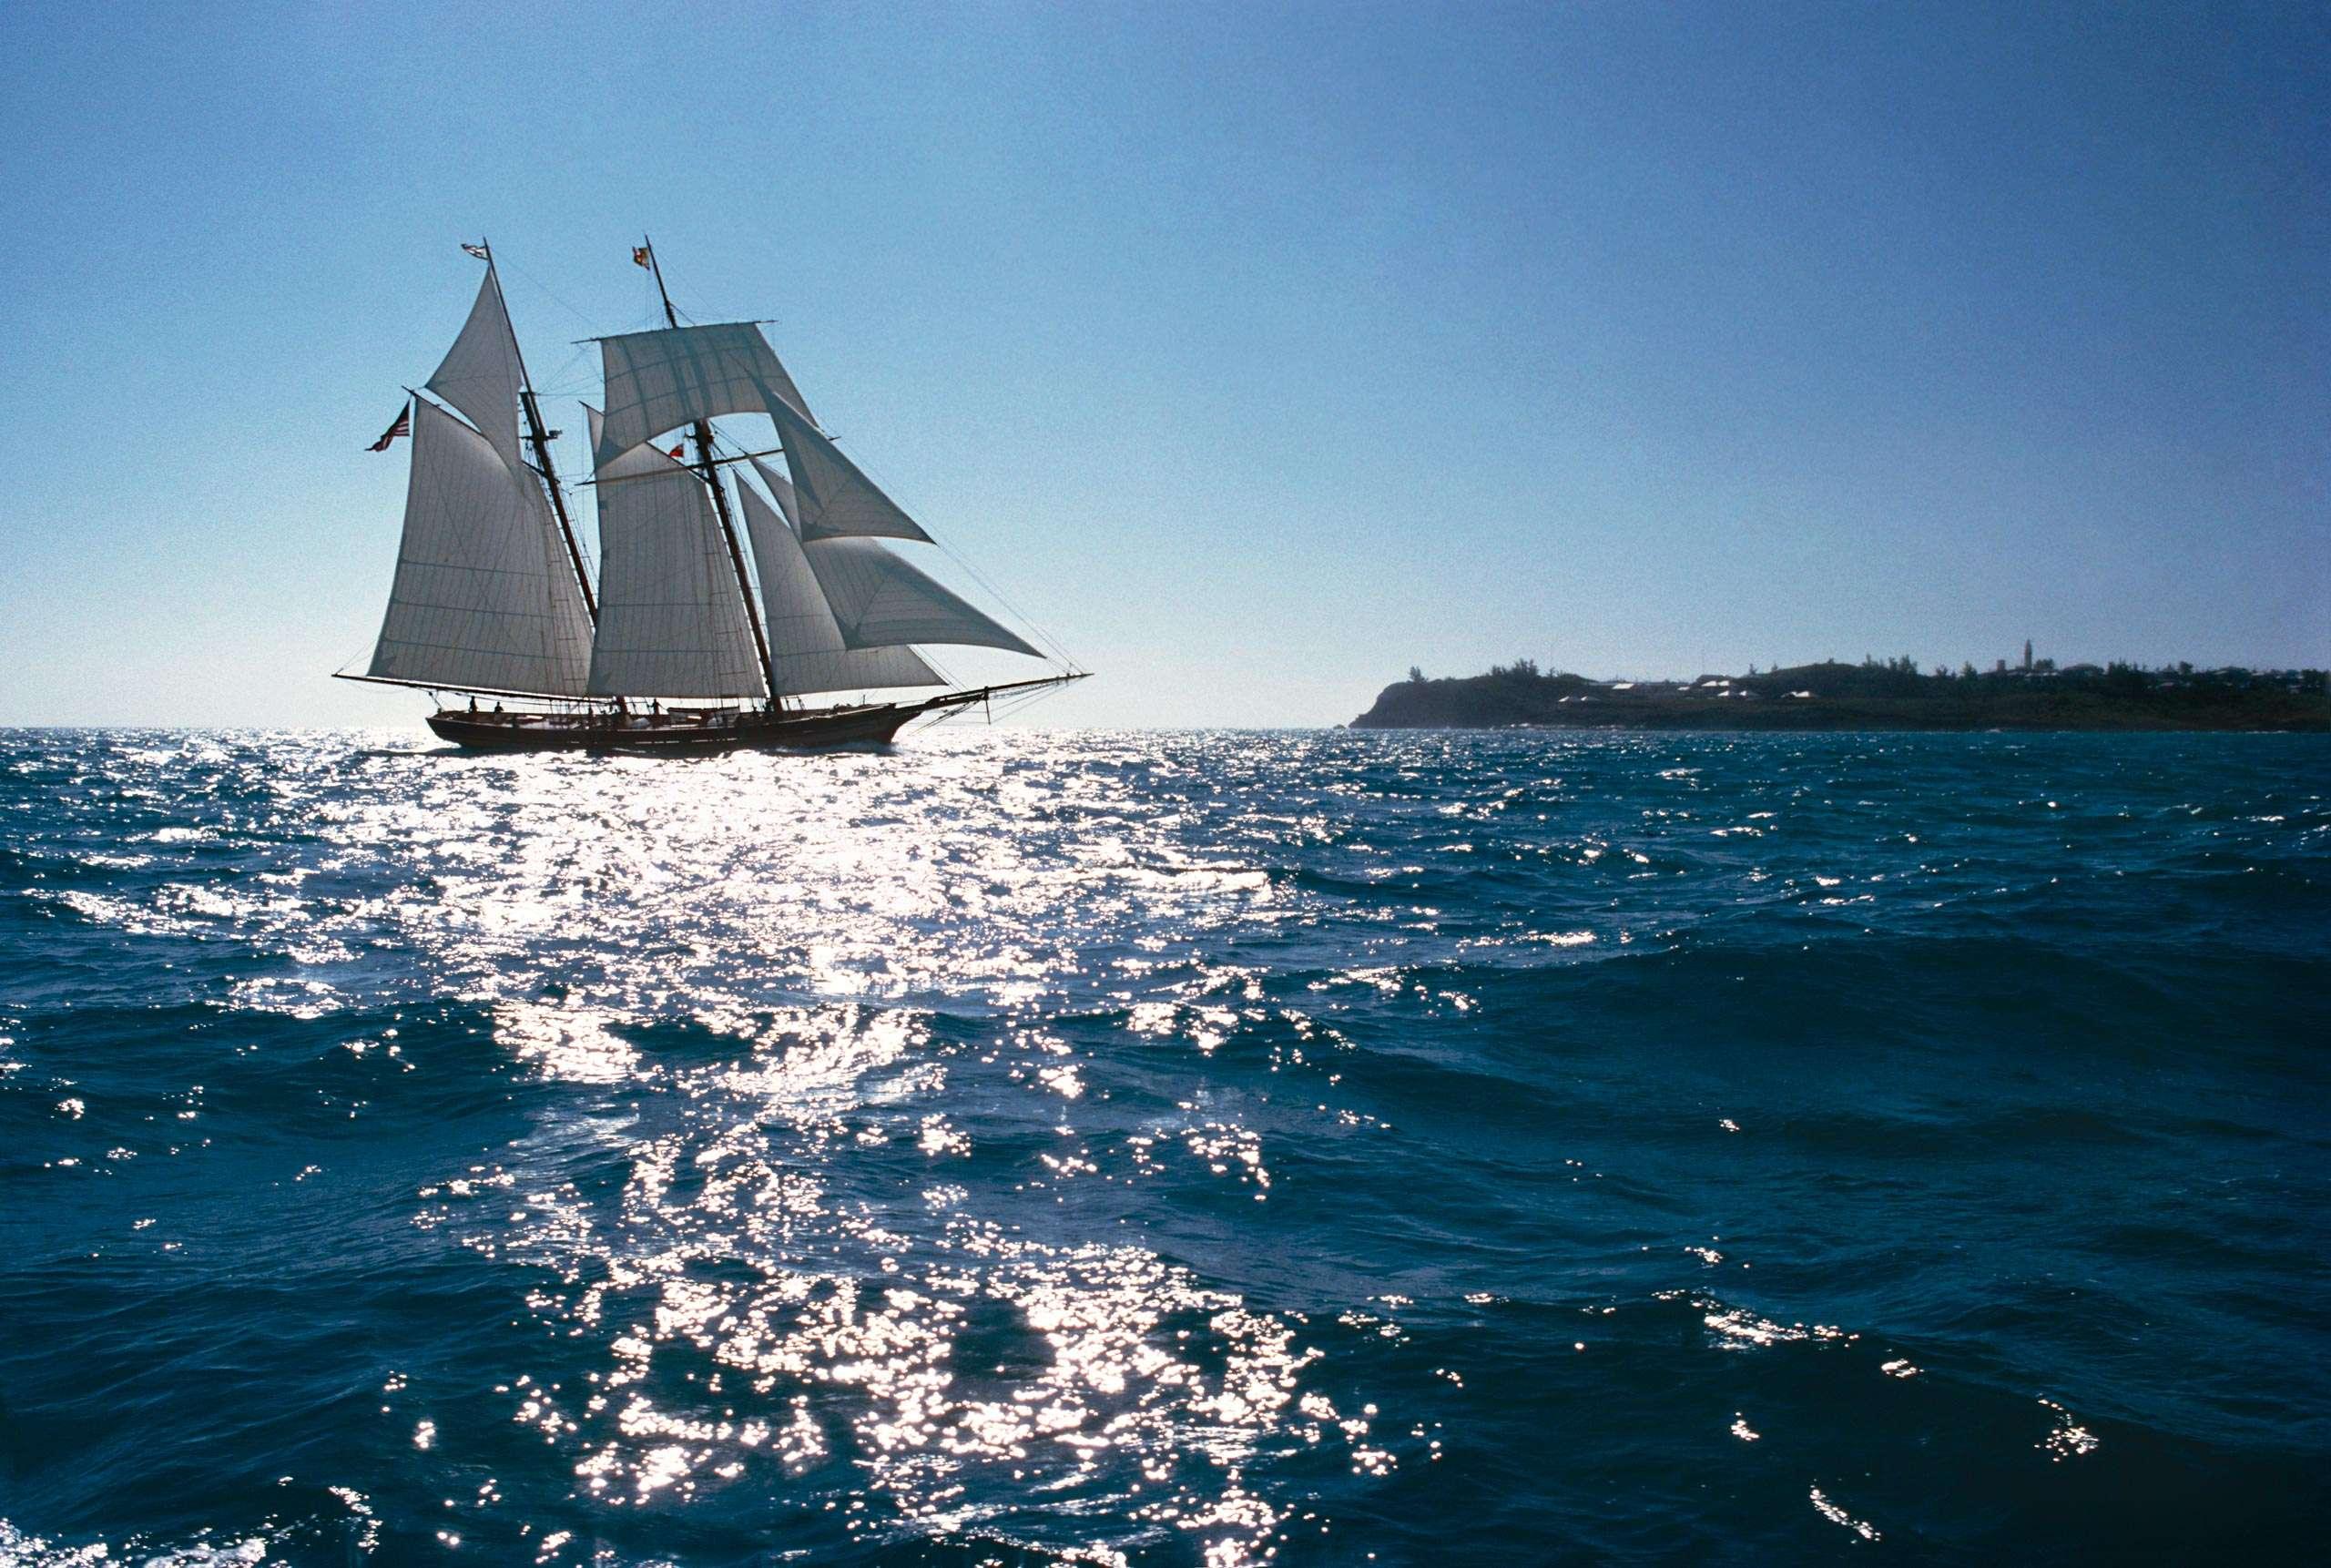 PORTFOLIO - Sailing - Windjammers #23   PCG082